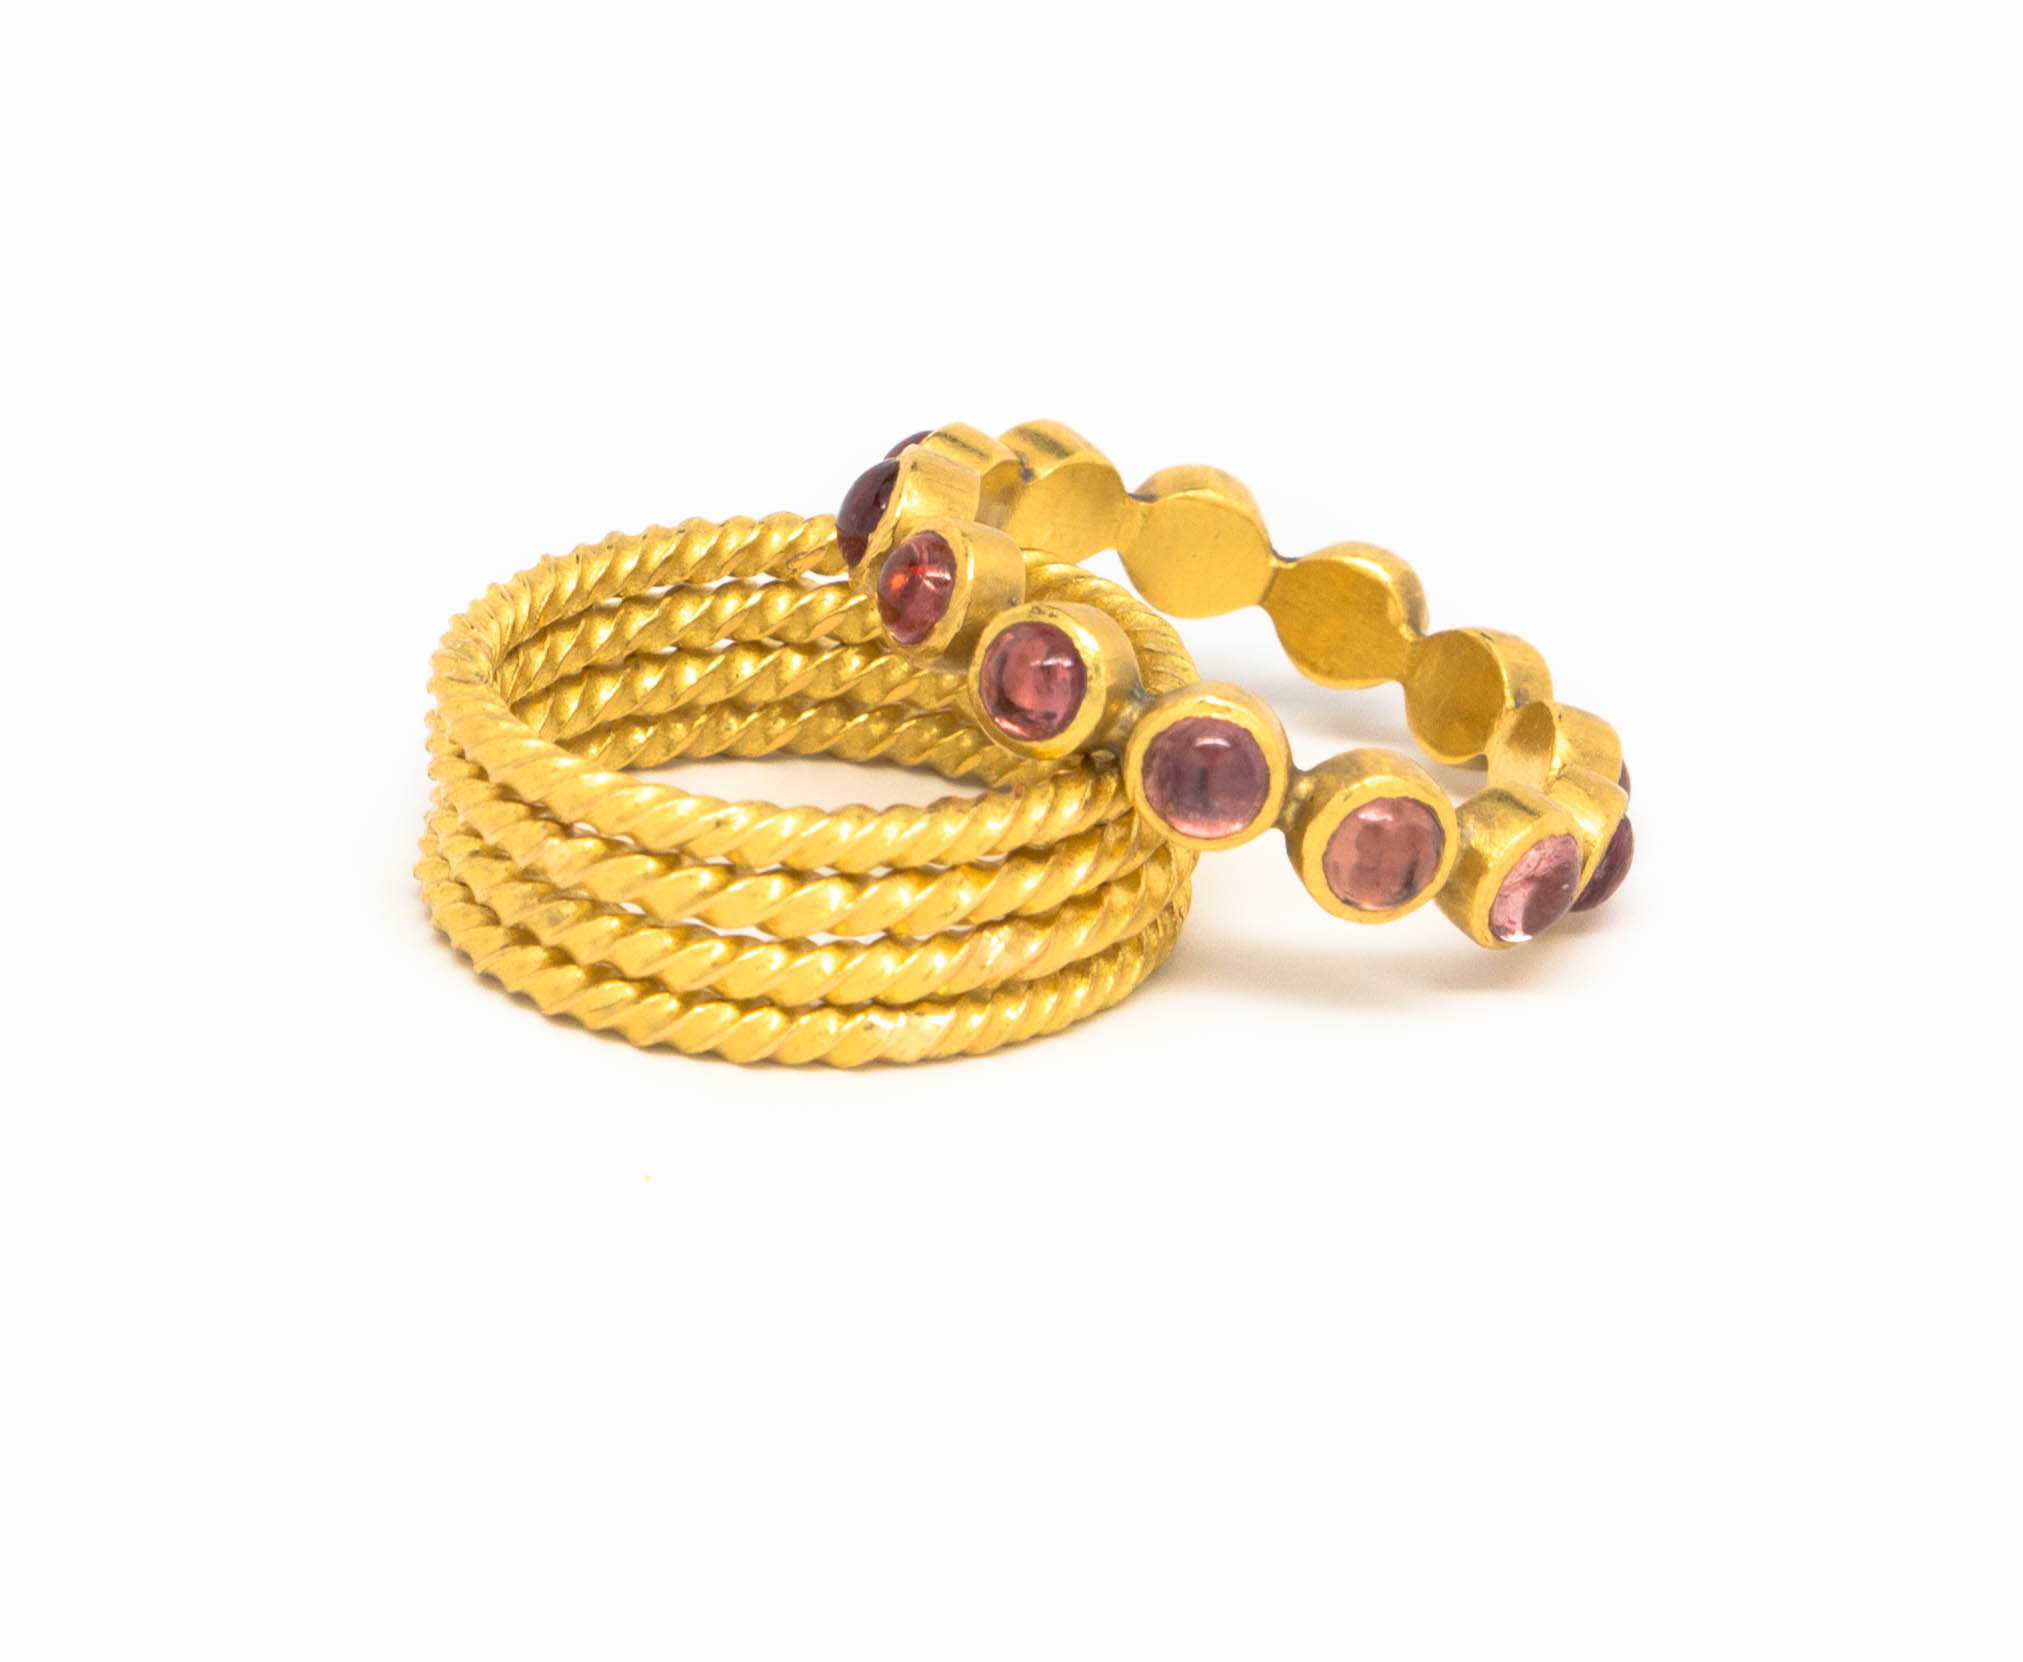 dec21 jewelry5-635.jpg